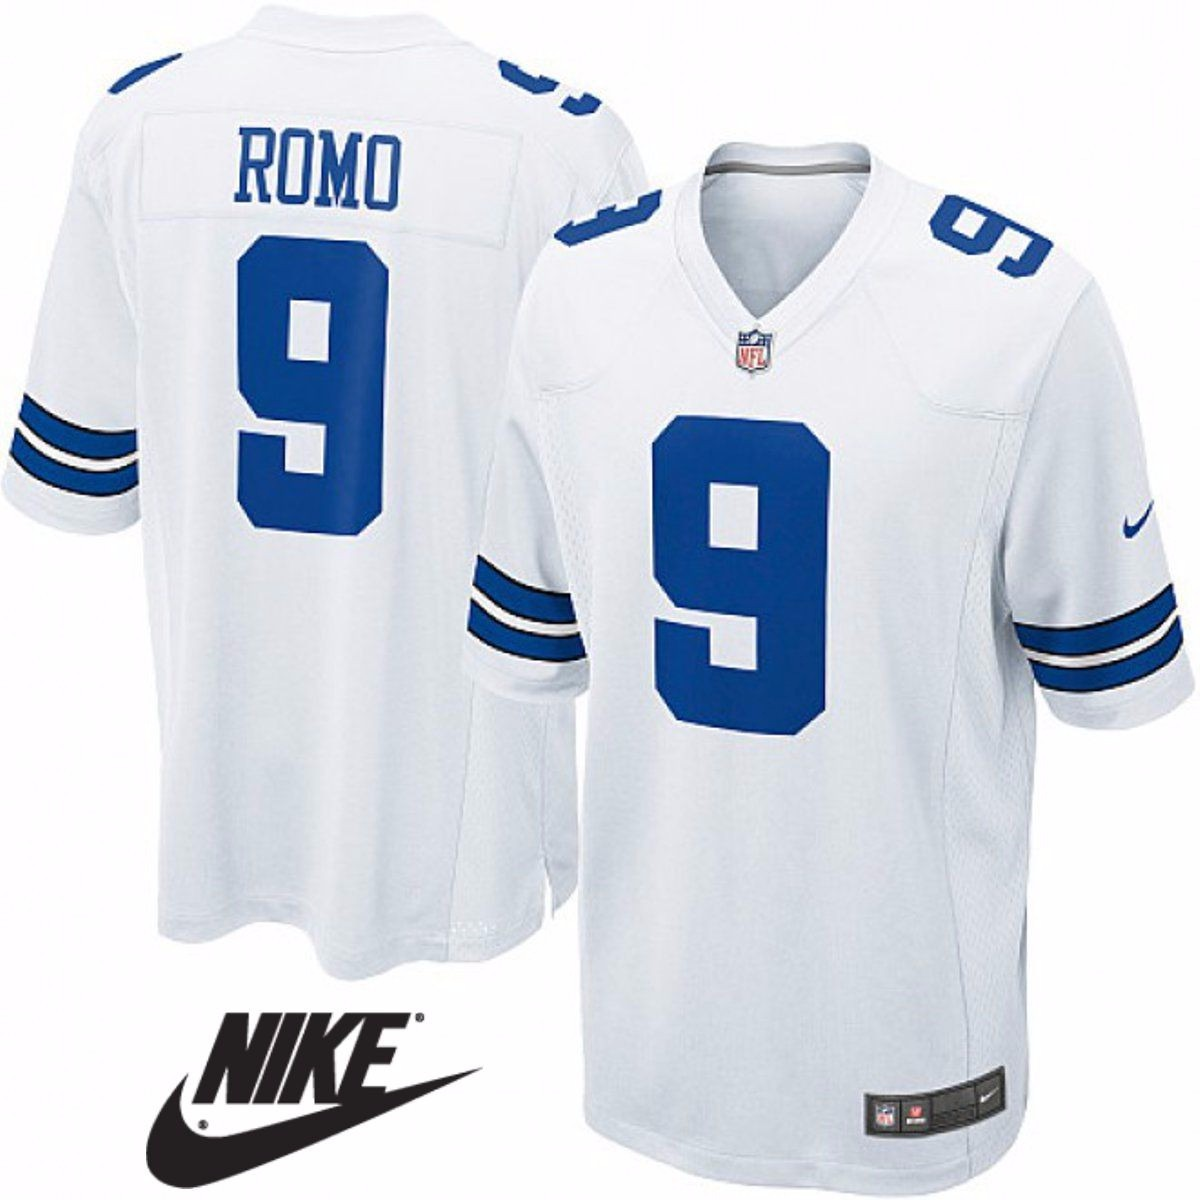 e209de6da8355 Camiseta Nfl Dallas Cowboys  9 Romo Futbol Americano Talle S -   799 ...